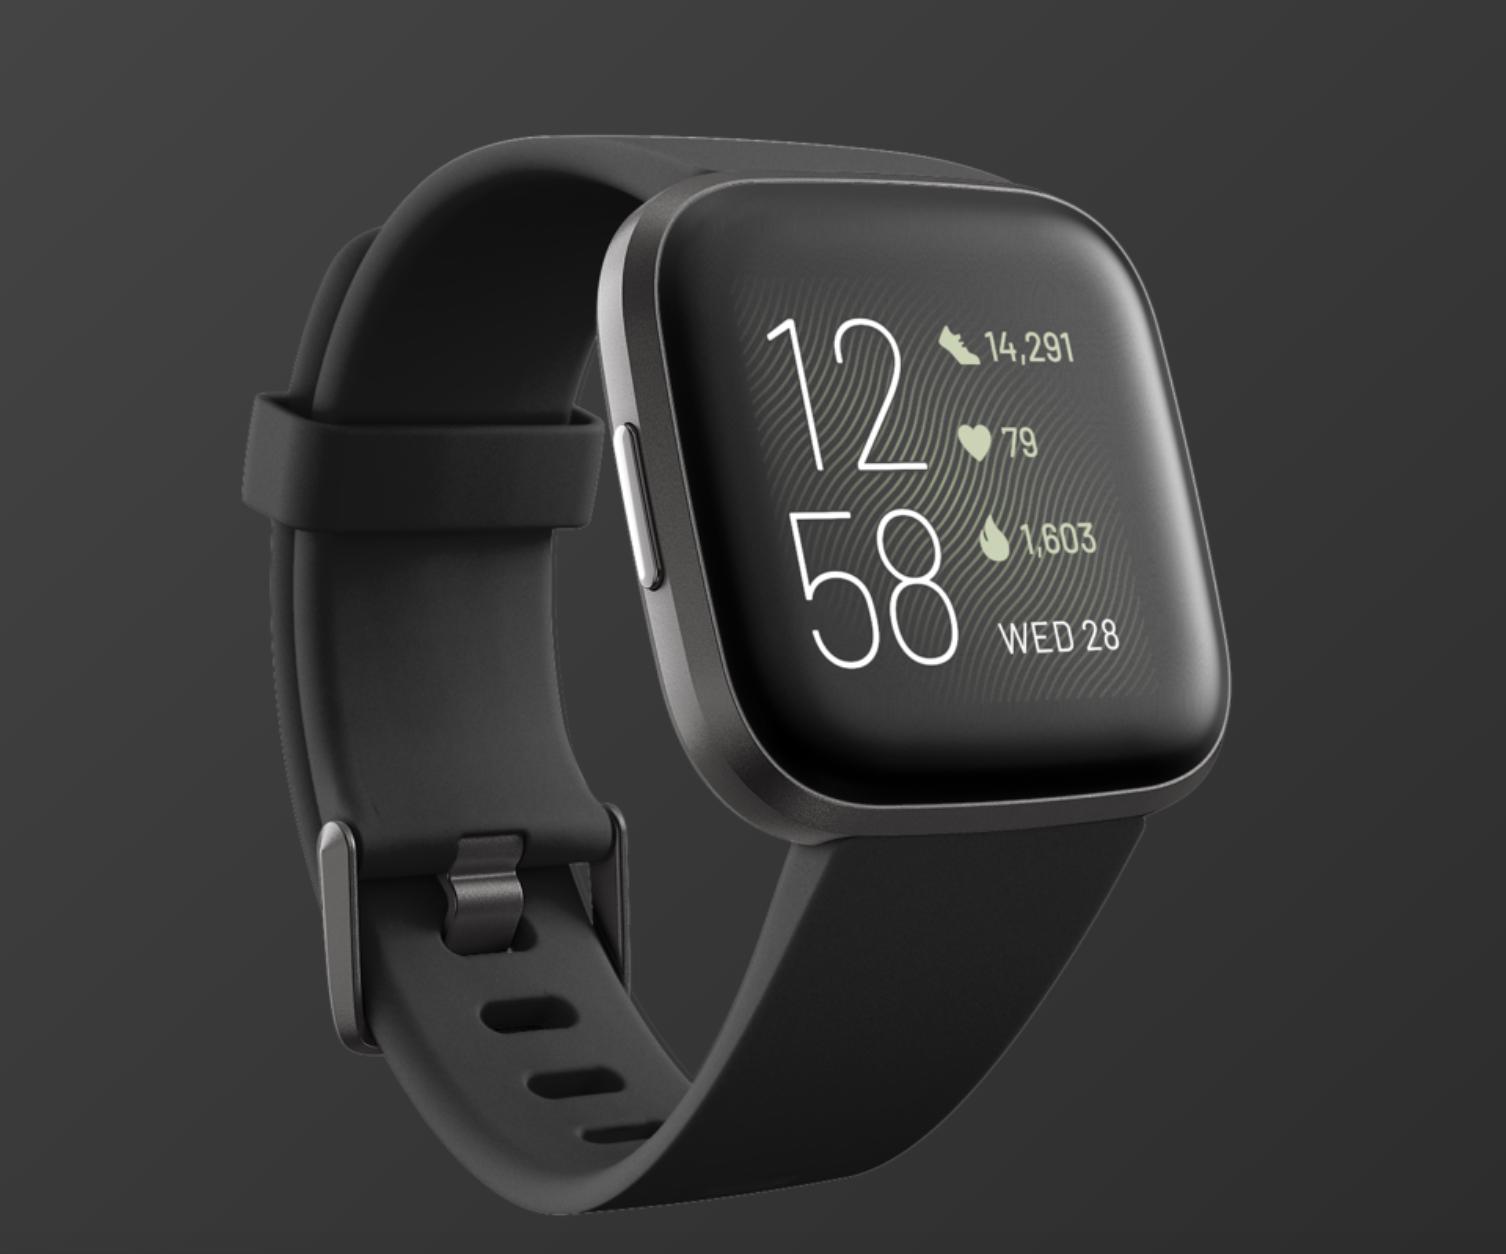 Fitbit Versa 2 Premium Health & Fitness SmartWatch on Sale